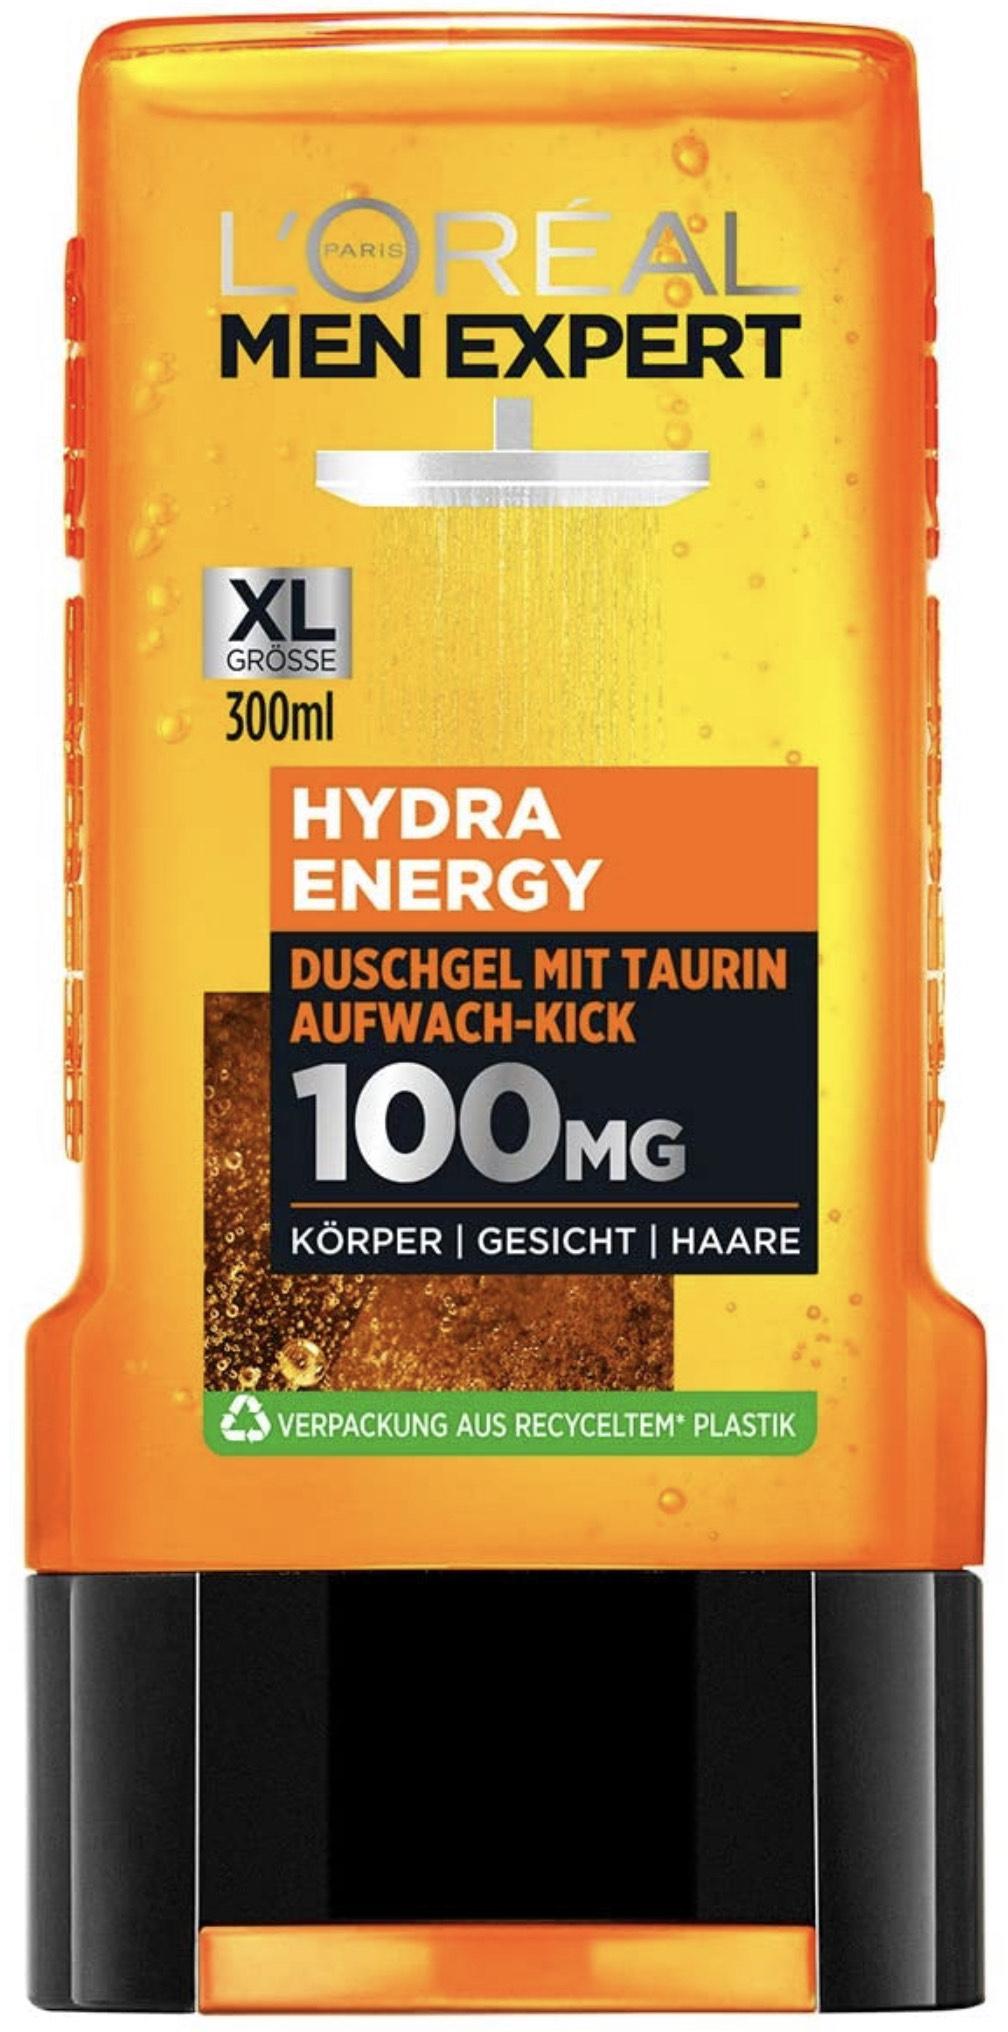 L'Oréal Men Expert Hydra Energy Taurin Duschgel bei Amazon